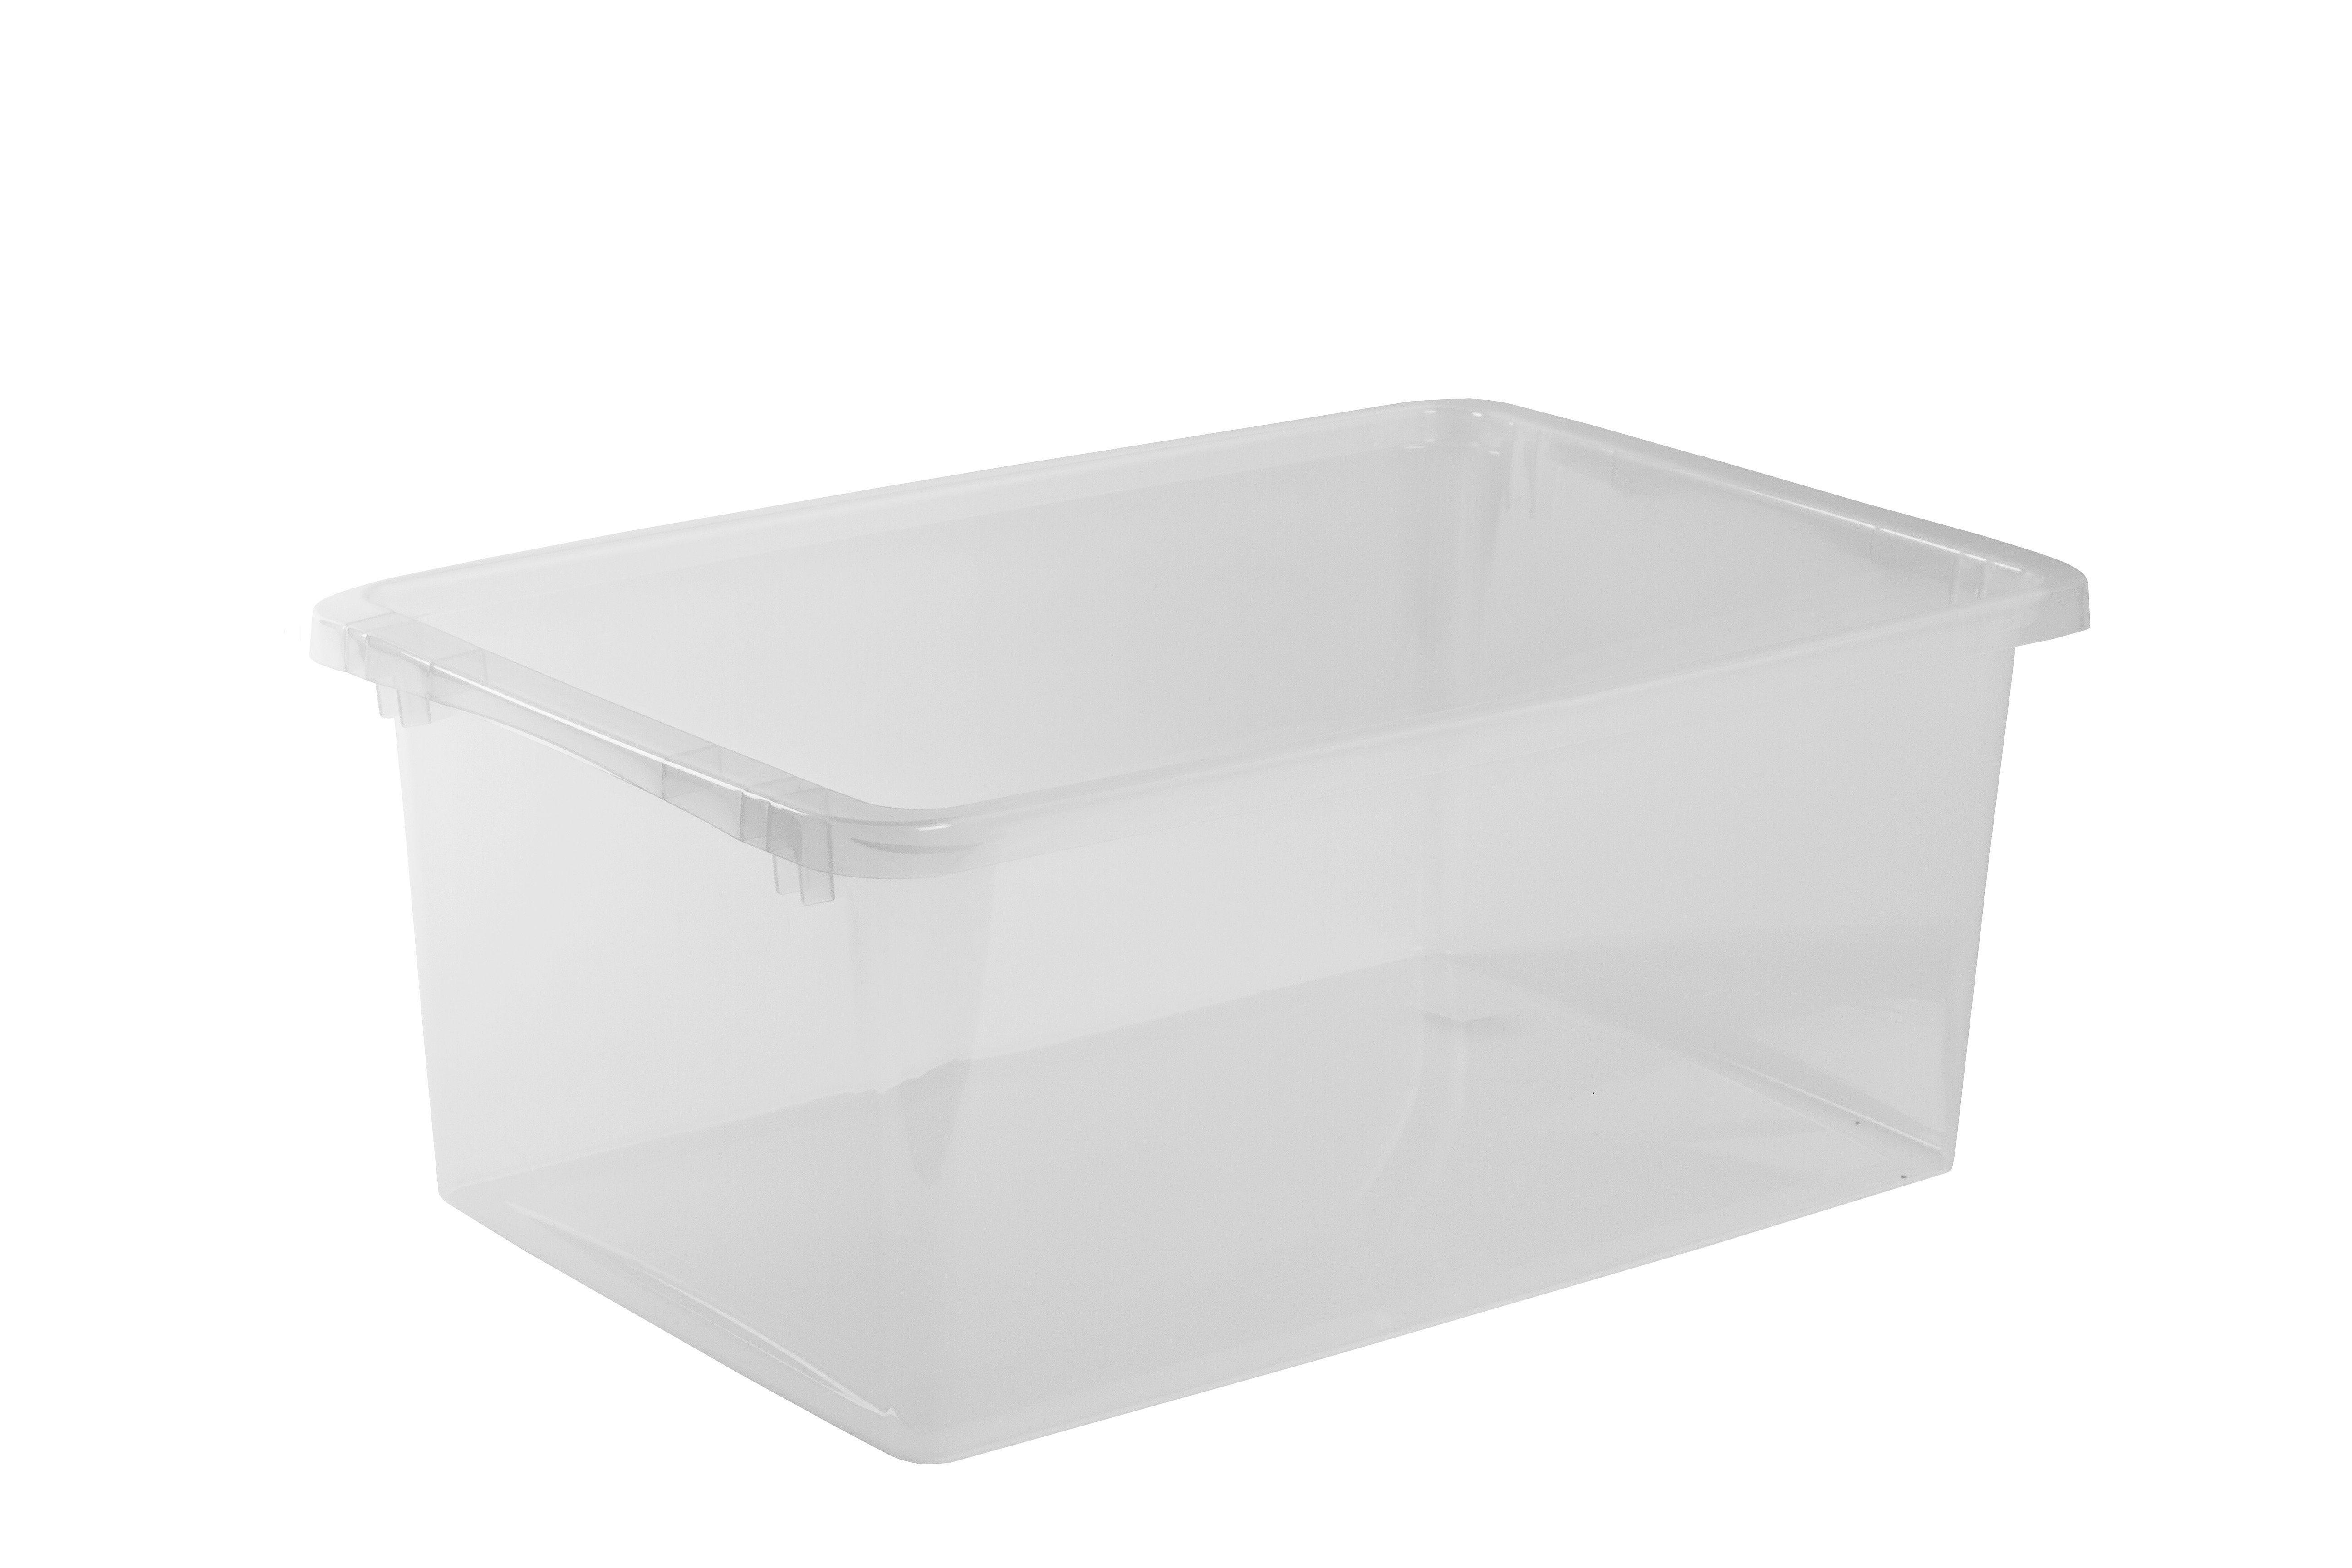 Store 7840-0500 Store IT Oppbevaringsboks transparent 40L